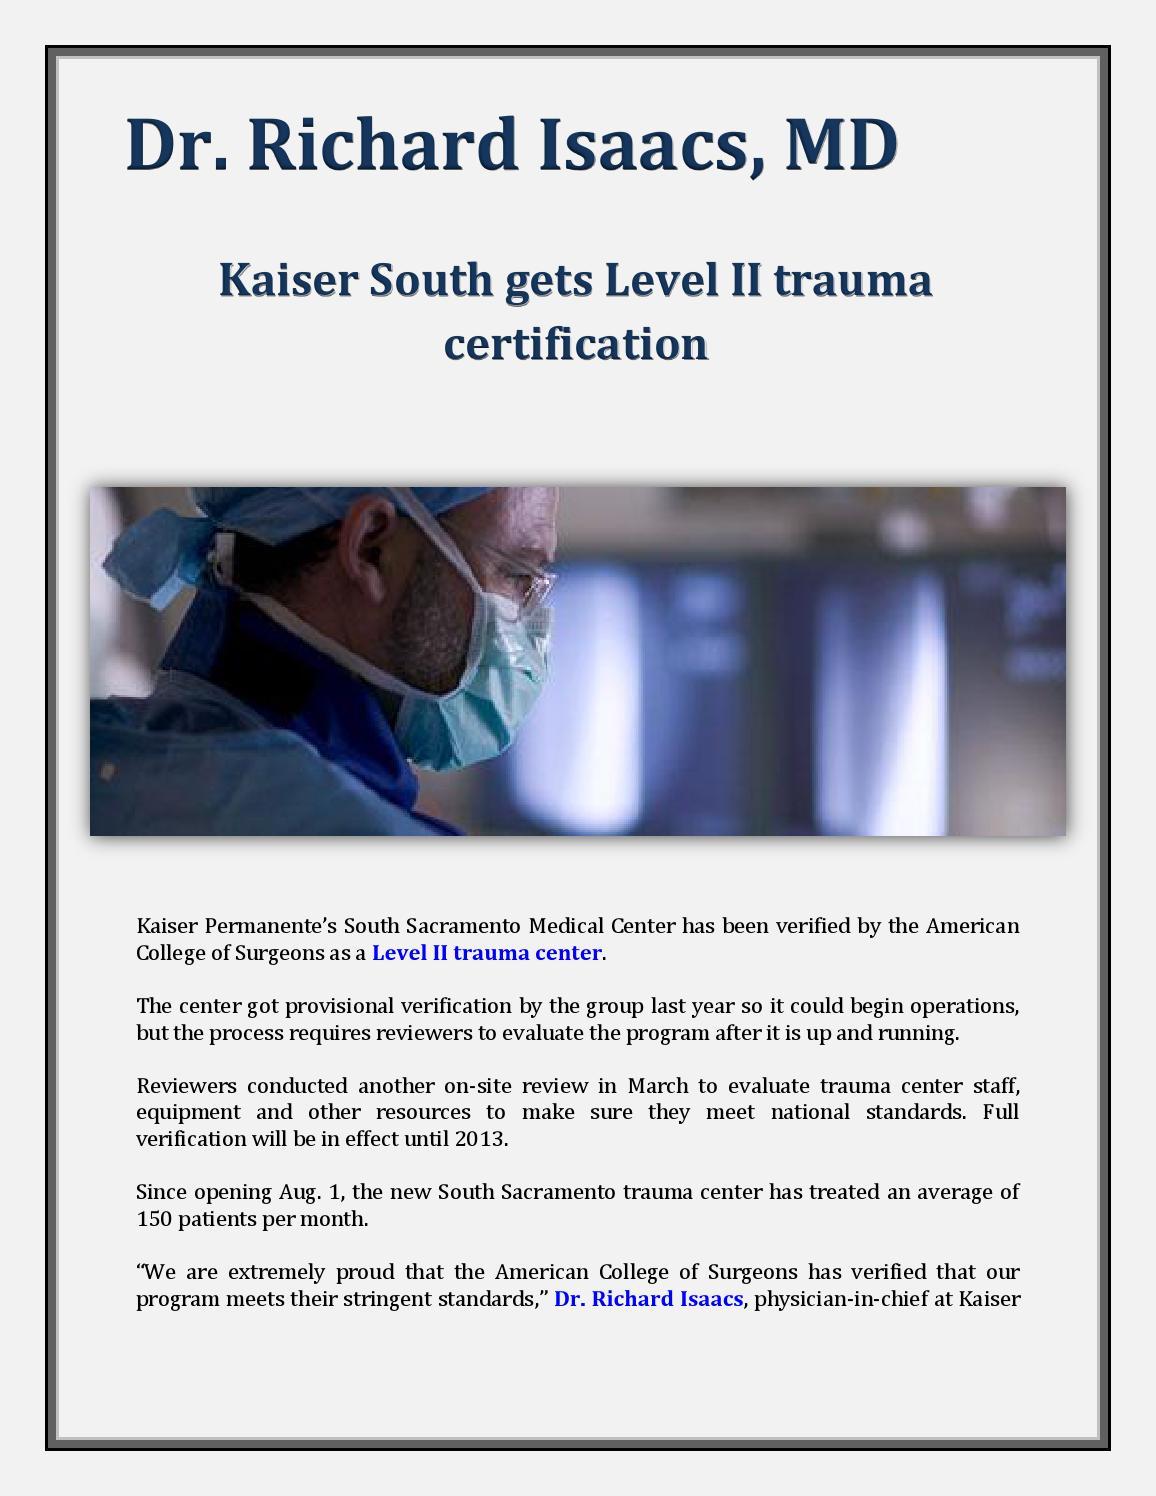 Dr richard isaacs md kaiser south gets level ii trauma dr richard isaacs md kaiser south gets level ii trauma certification by kawamoto chikaze issuu xflitez Images